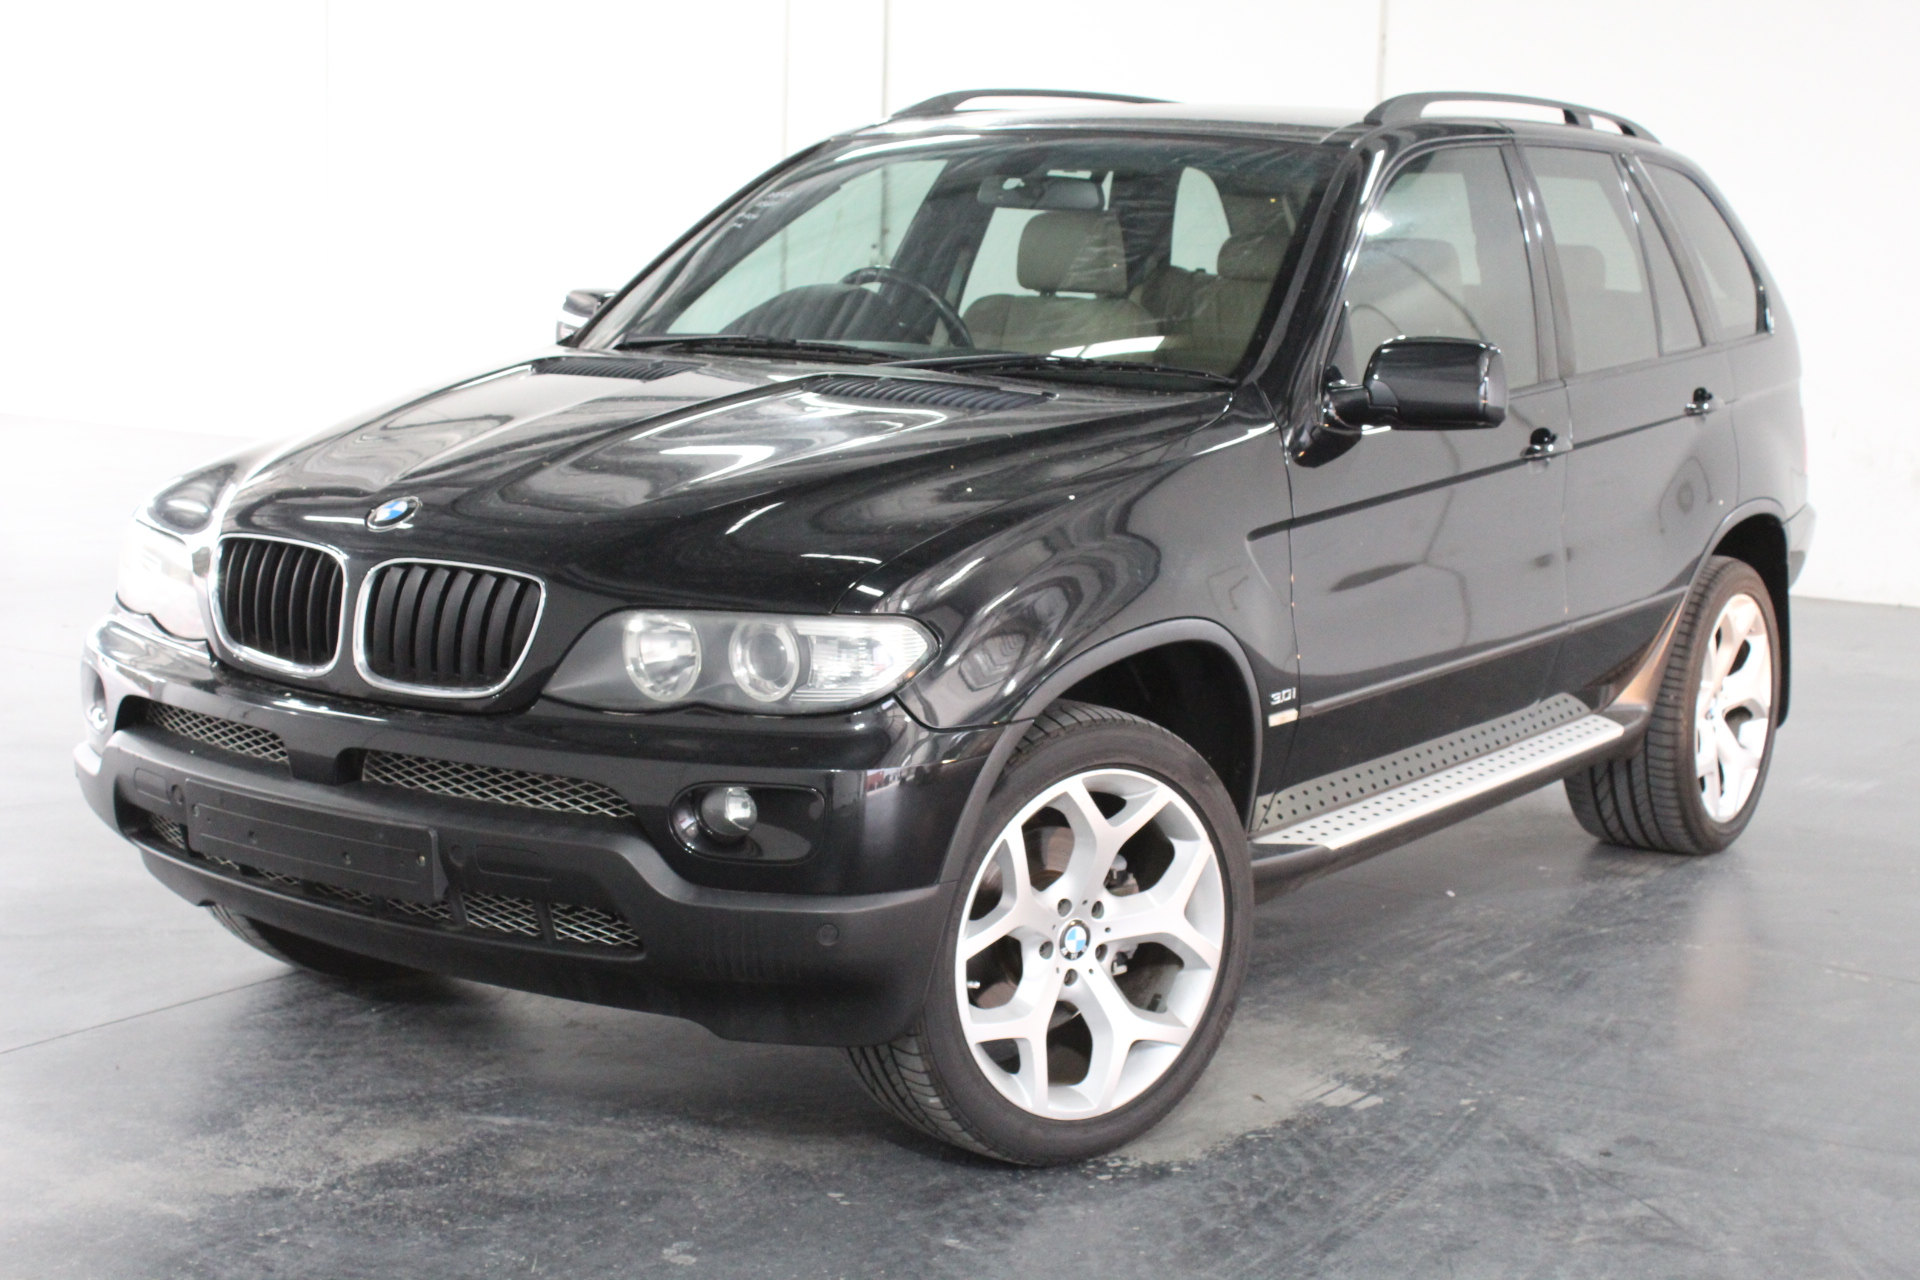 2006 BMW X5 3.0i E53 Automatic Wagon